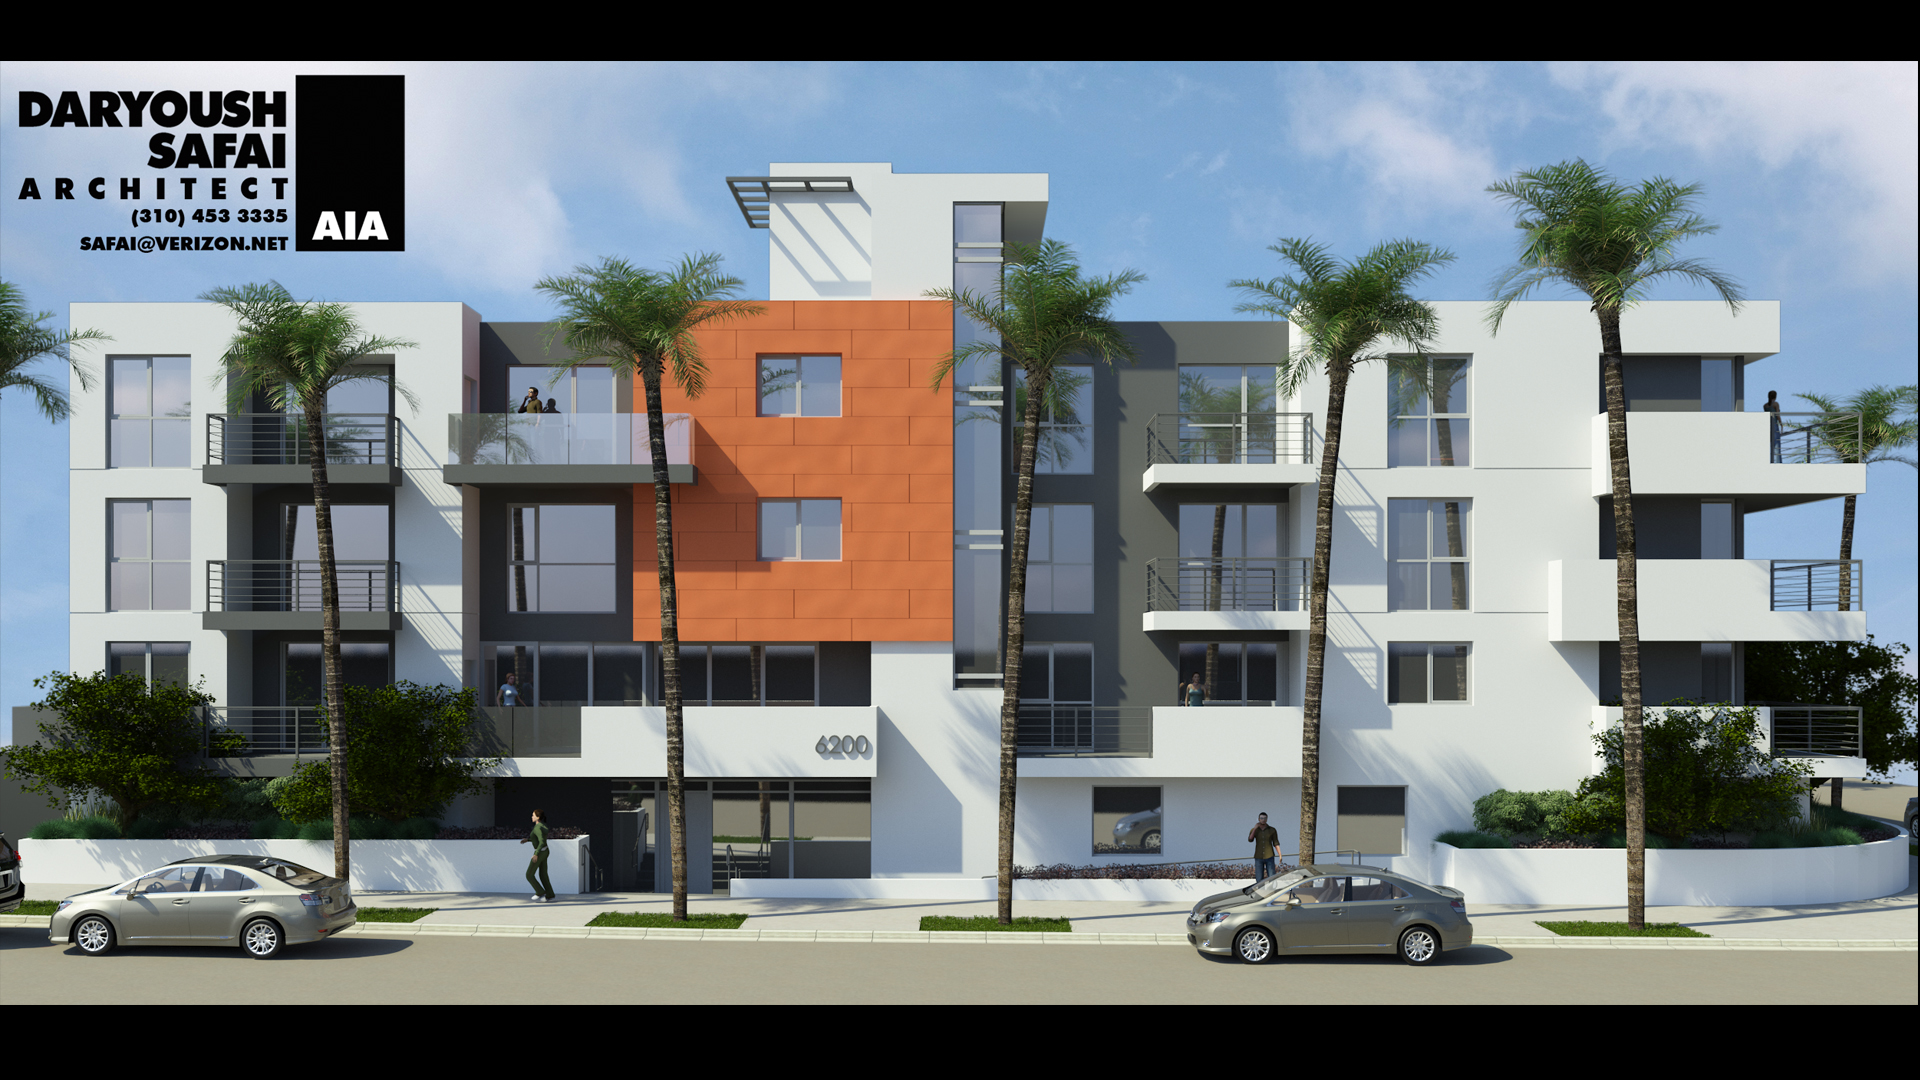 22 Units - 6200 Kester Ave, Van Nuys, CA 91411